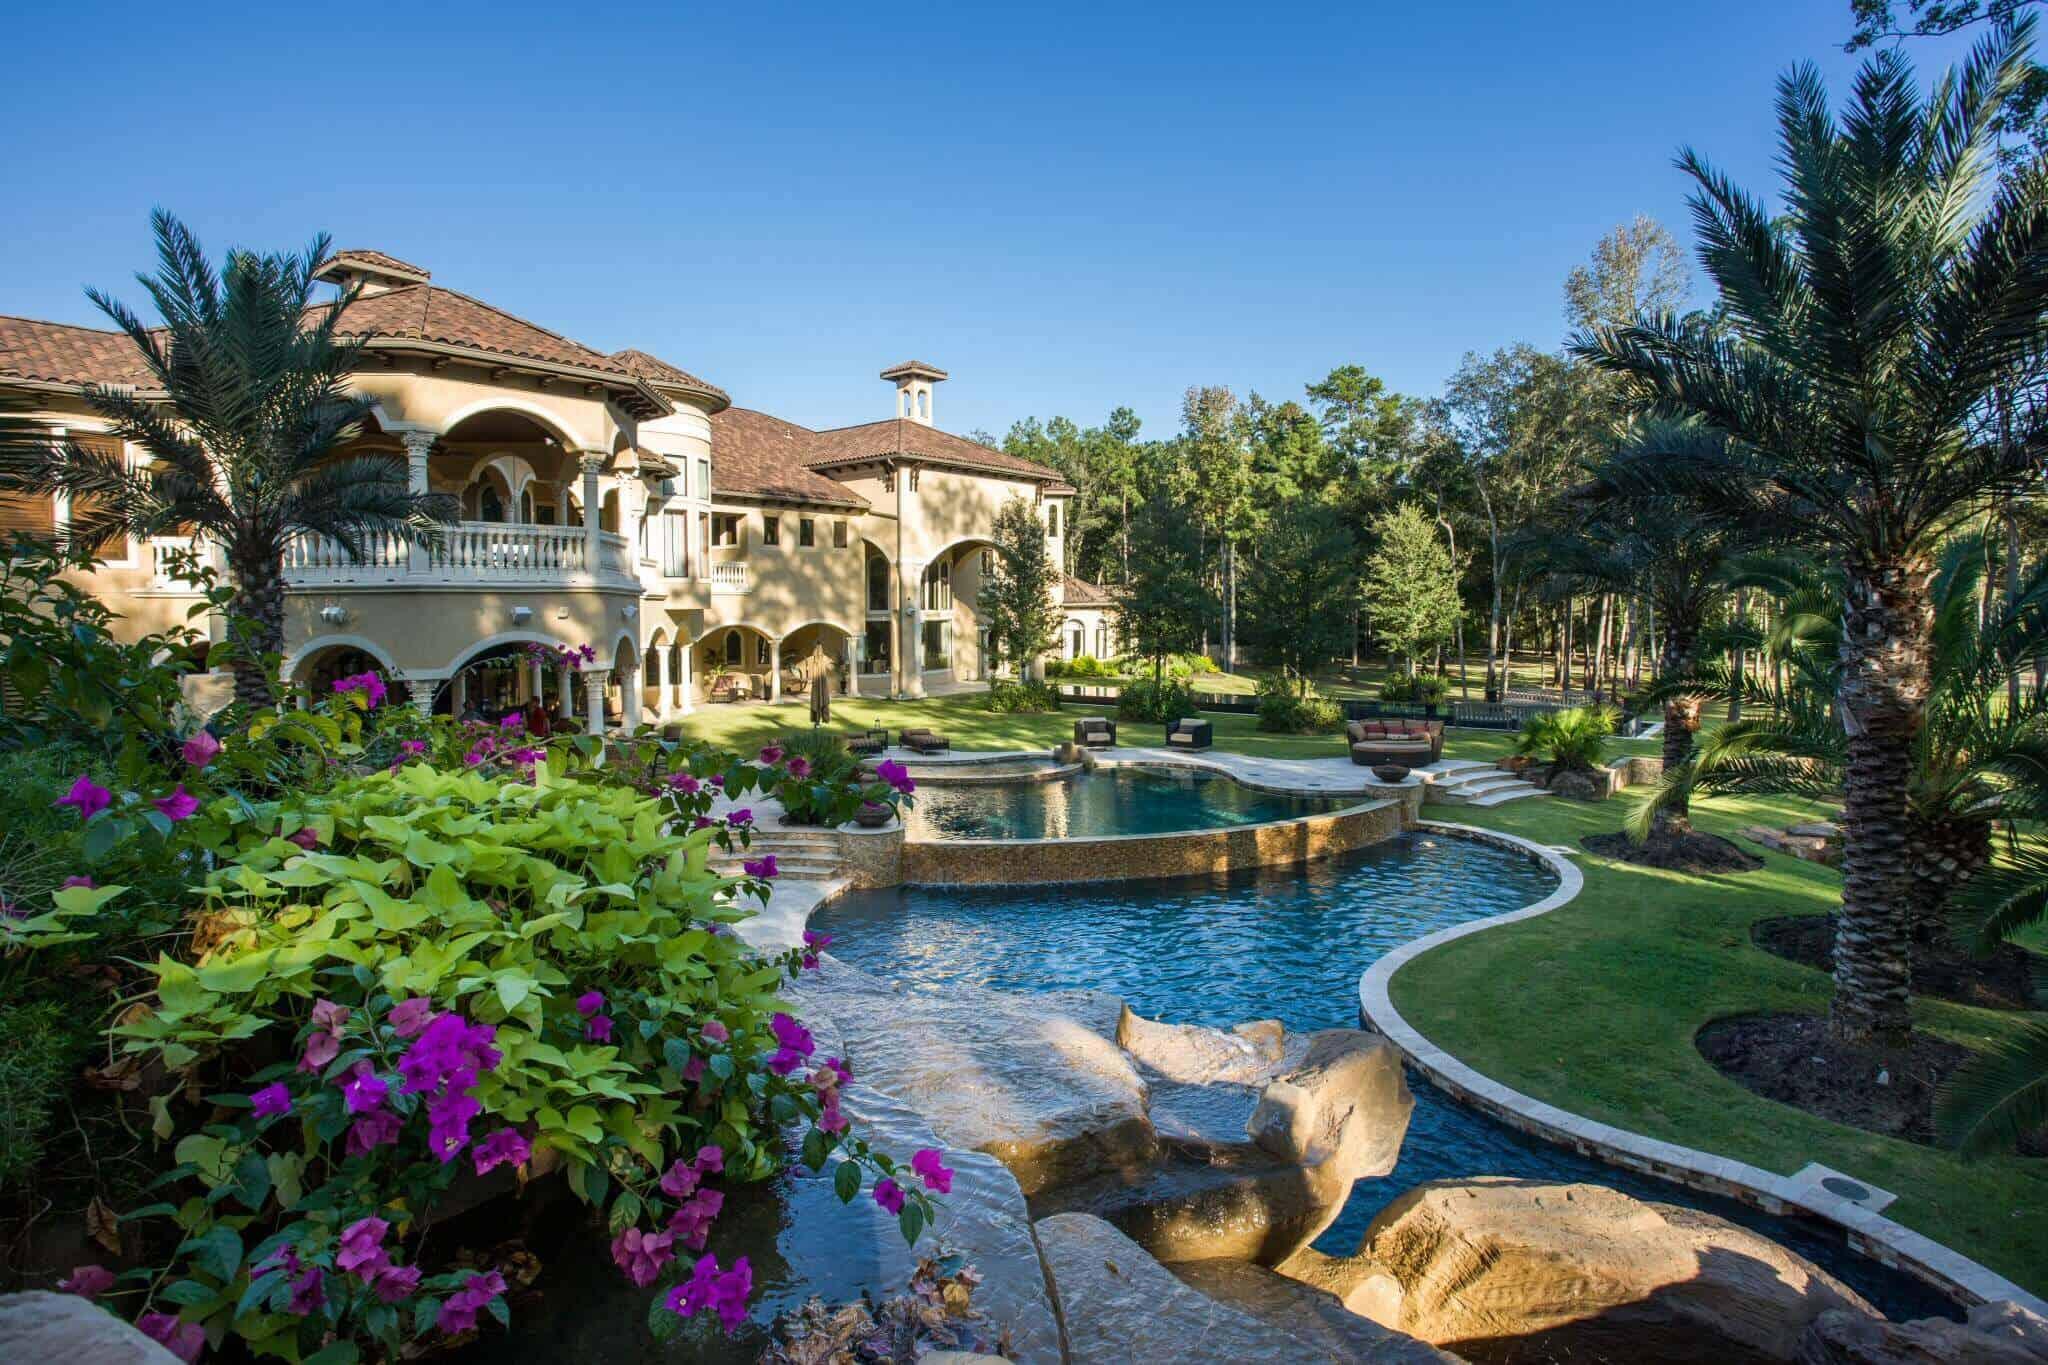 Swimming Pool Contractors Blog - I Love Marquise Pools